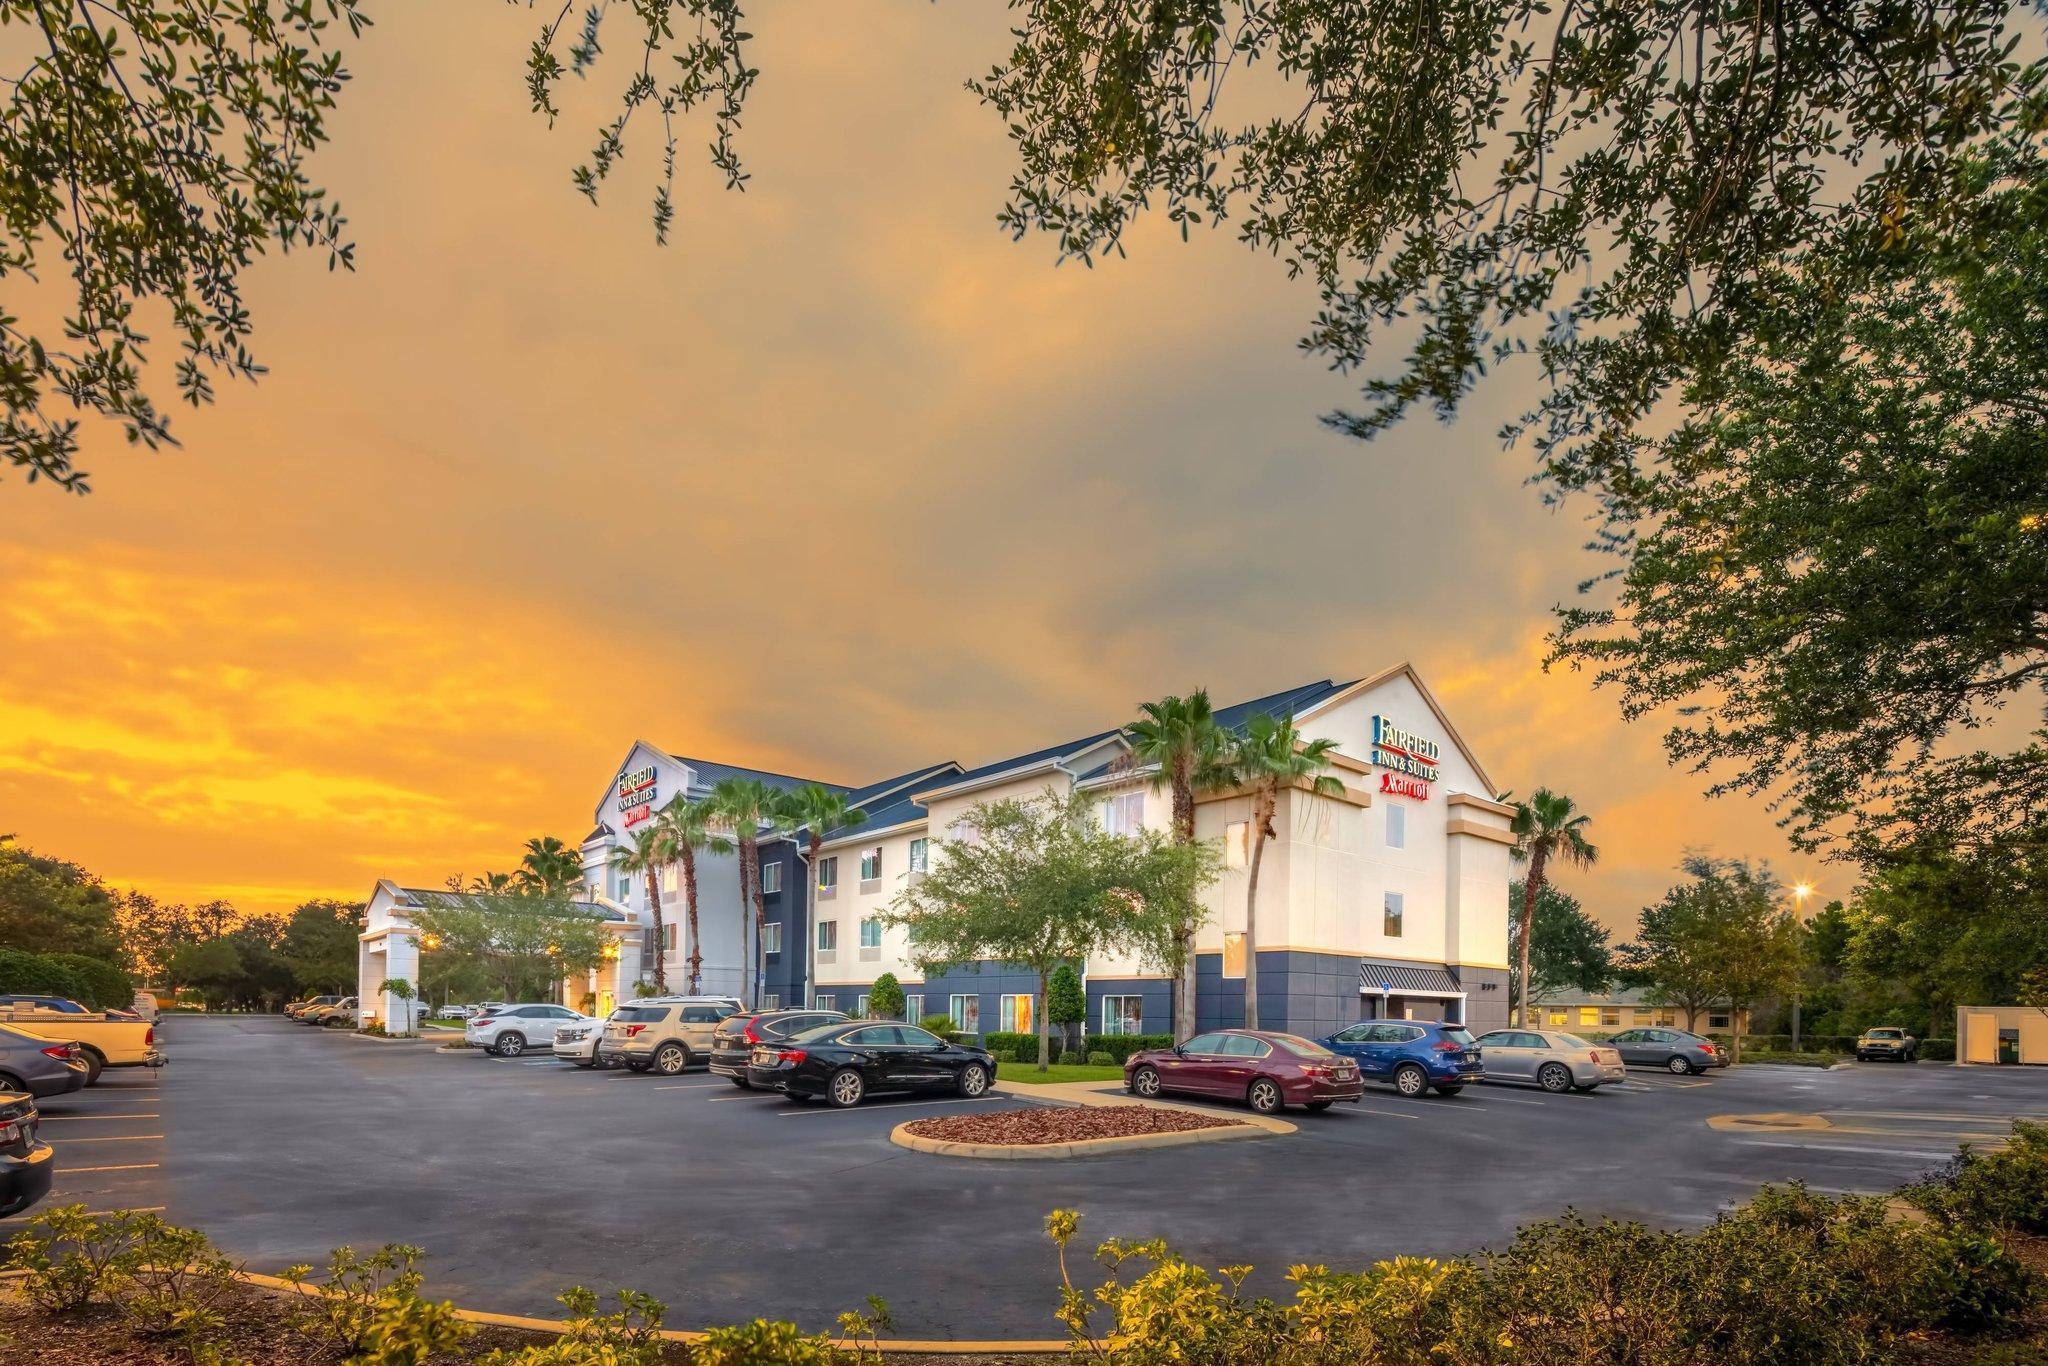 Fairfield Inn And Suites Sarasota Lakewood Ranch